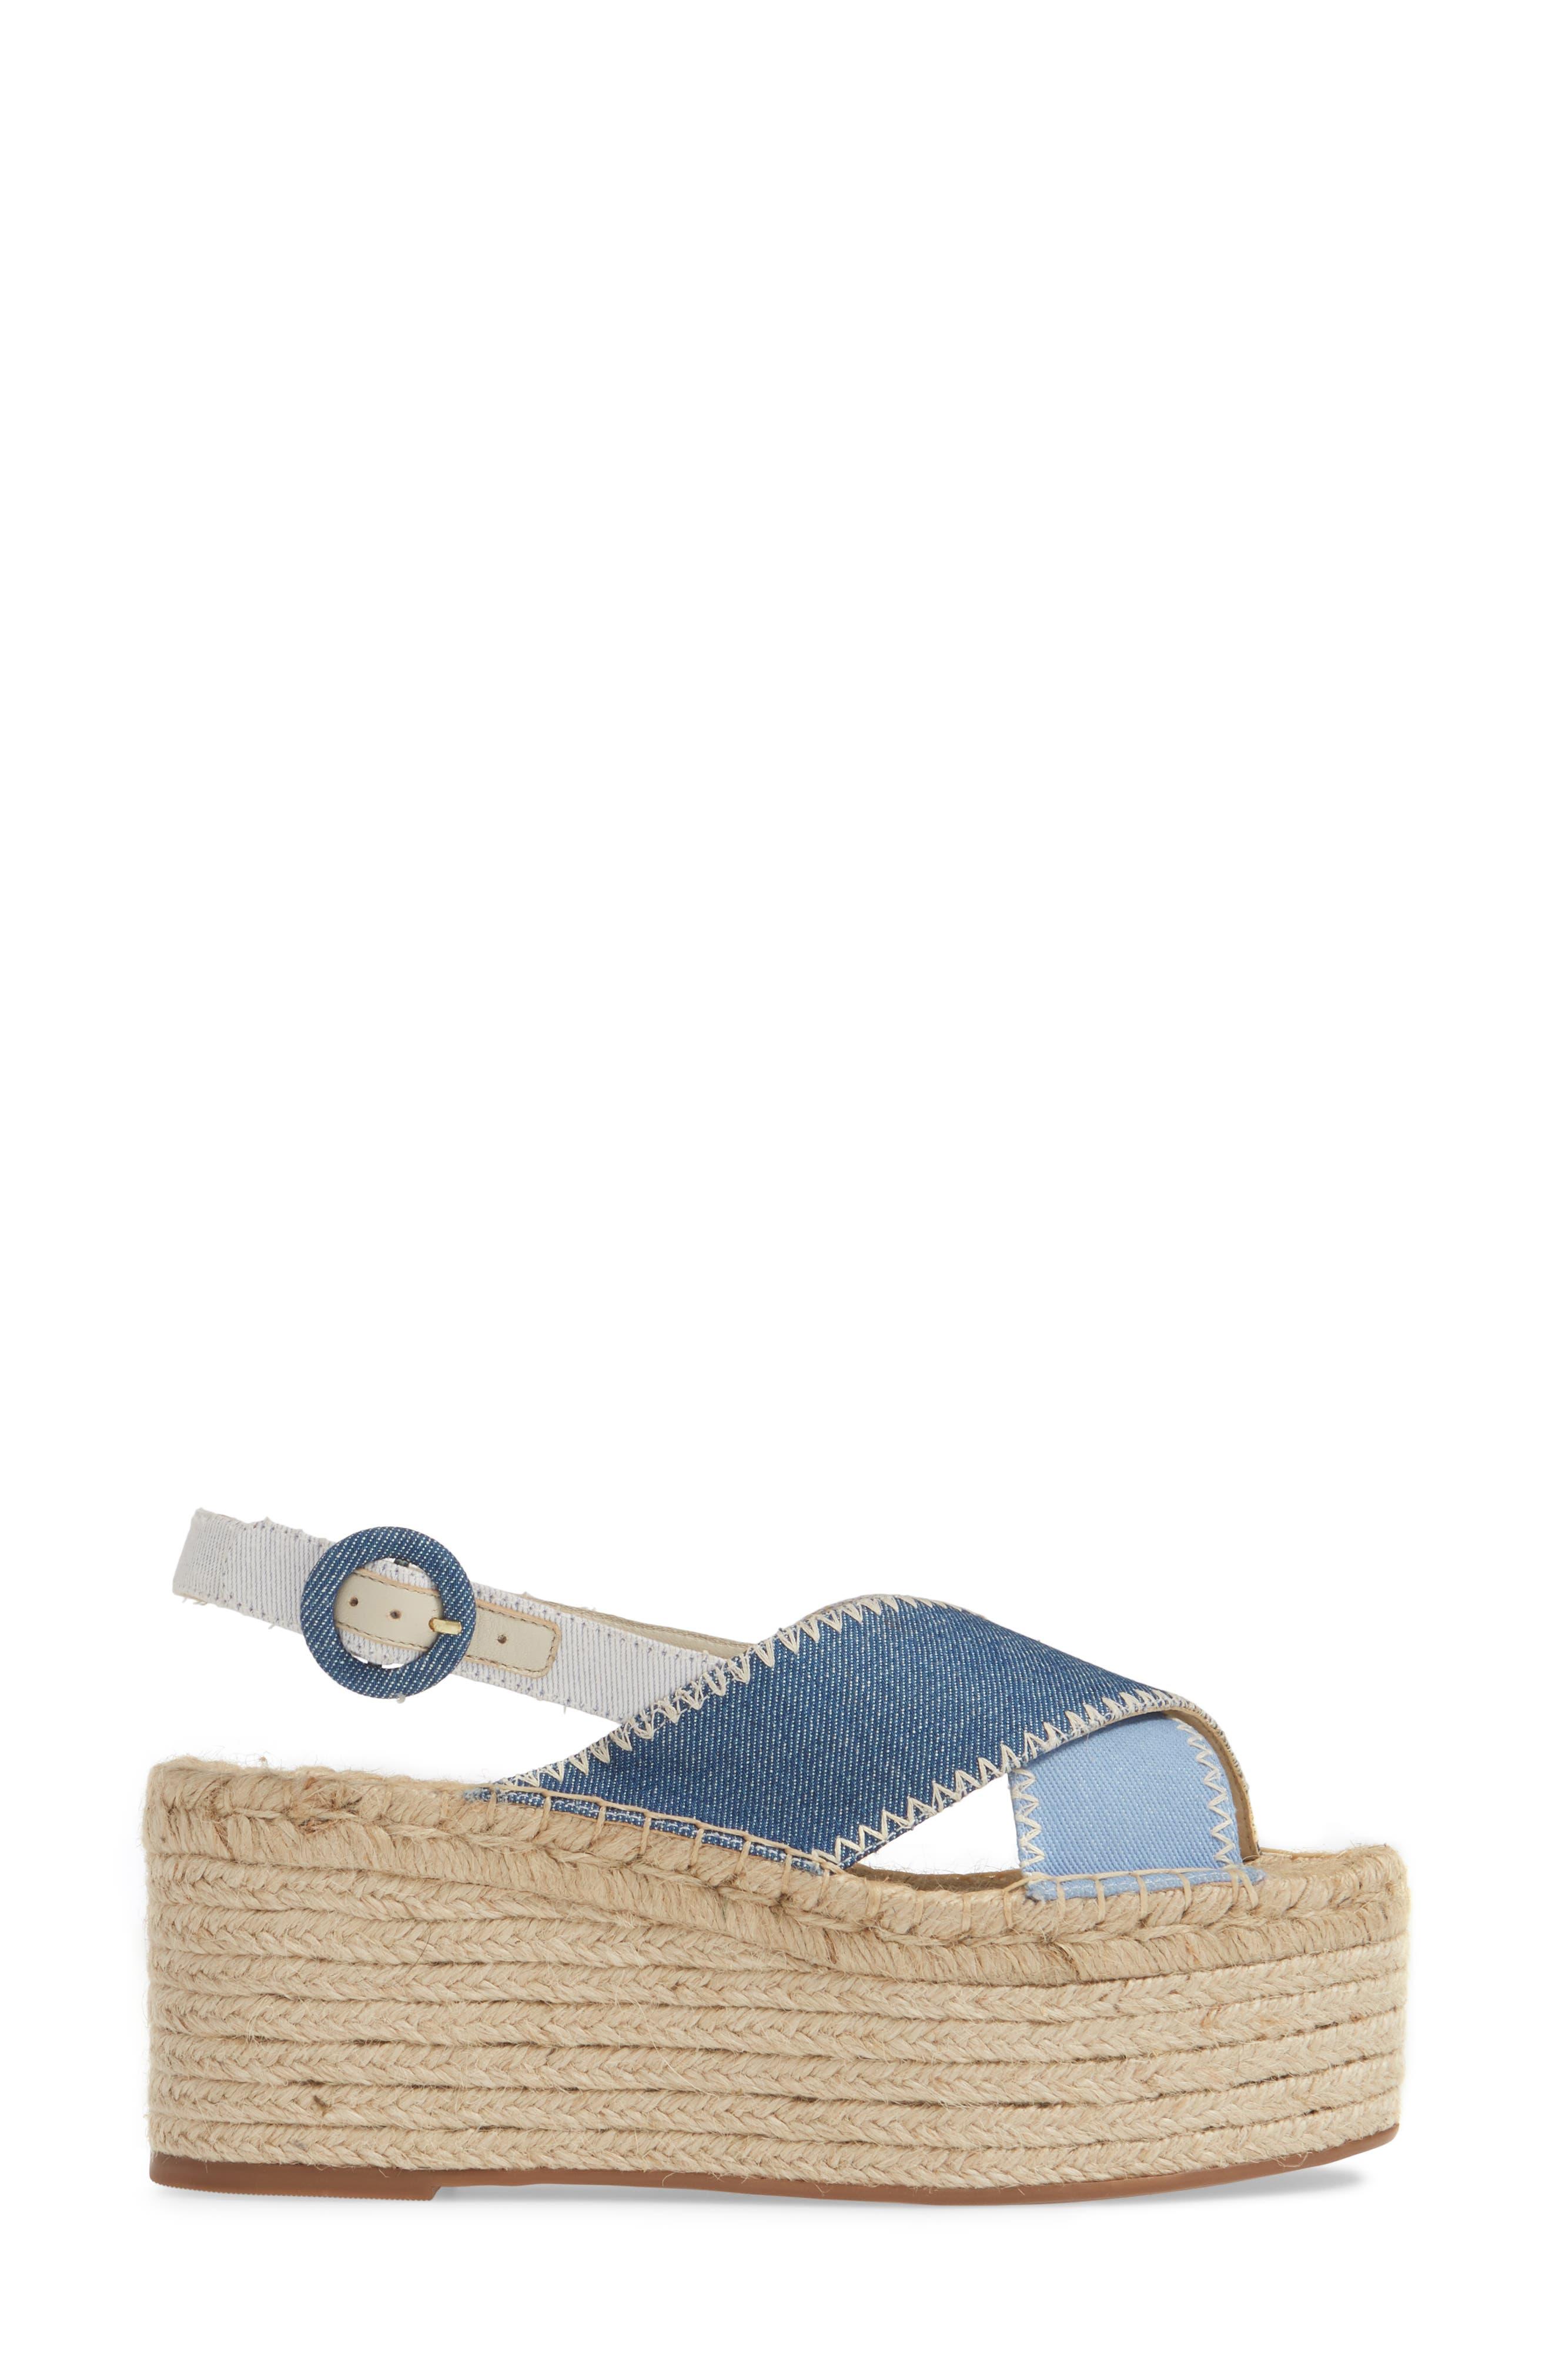 ALICE + OLIVIA, Fayen Platform Sandal, Alternate thumbnail 3, color, DARK BLUE/ LIGHT BLUE/ IVORY